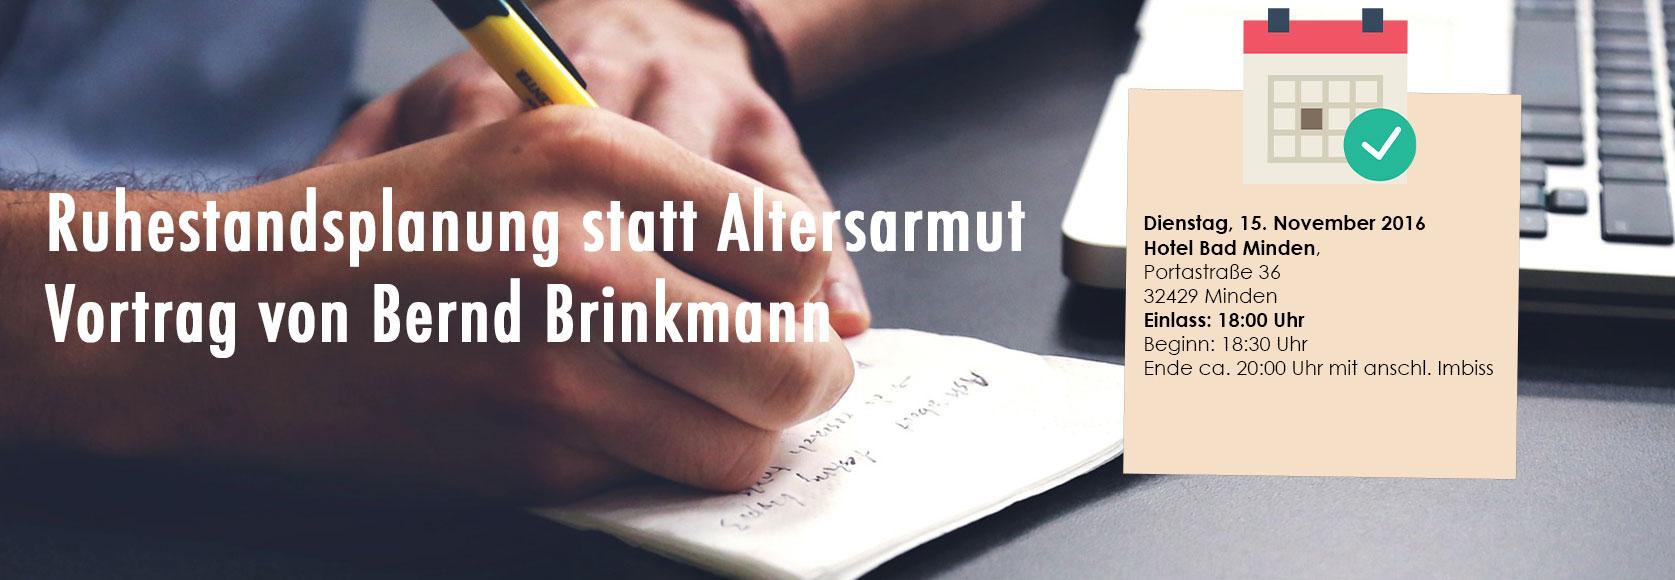 Ruhestandsplanung statt Altersarmut - Bernd Brinkmann